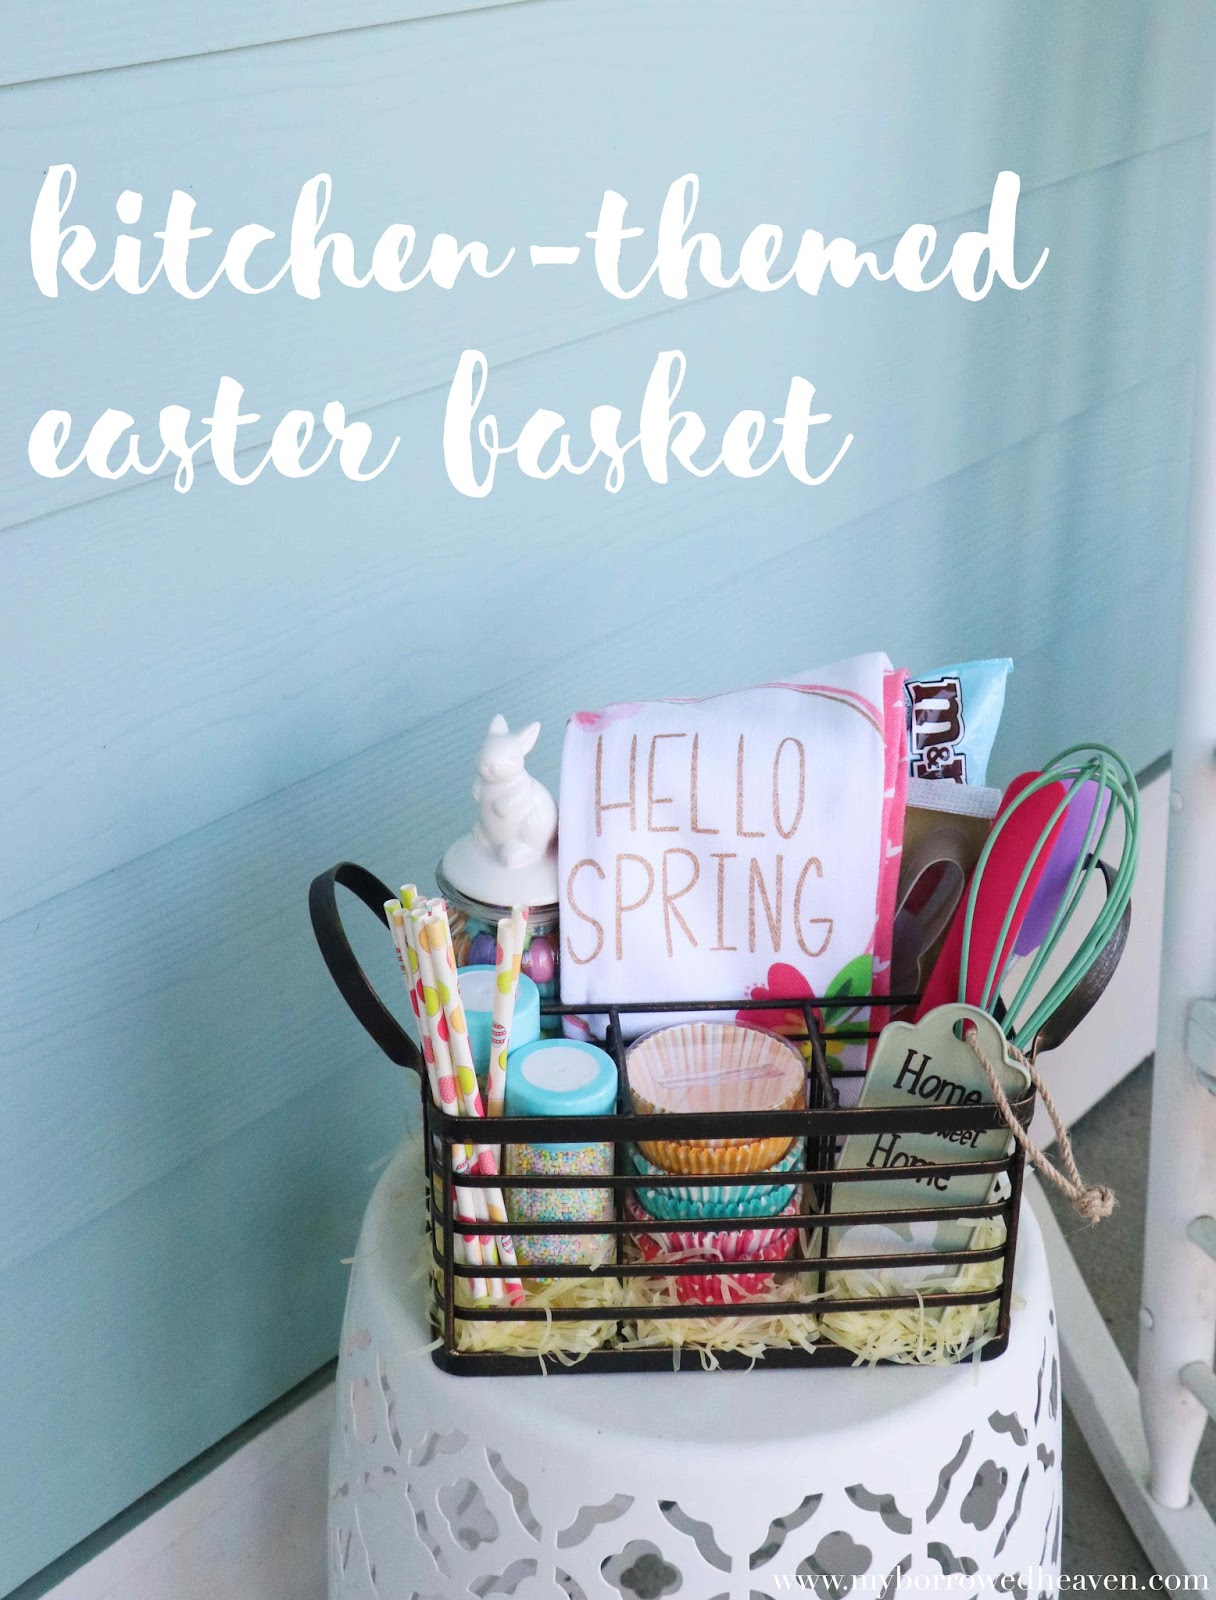 borrowed heaven: Kitchen-Themed Easter Basket